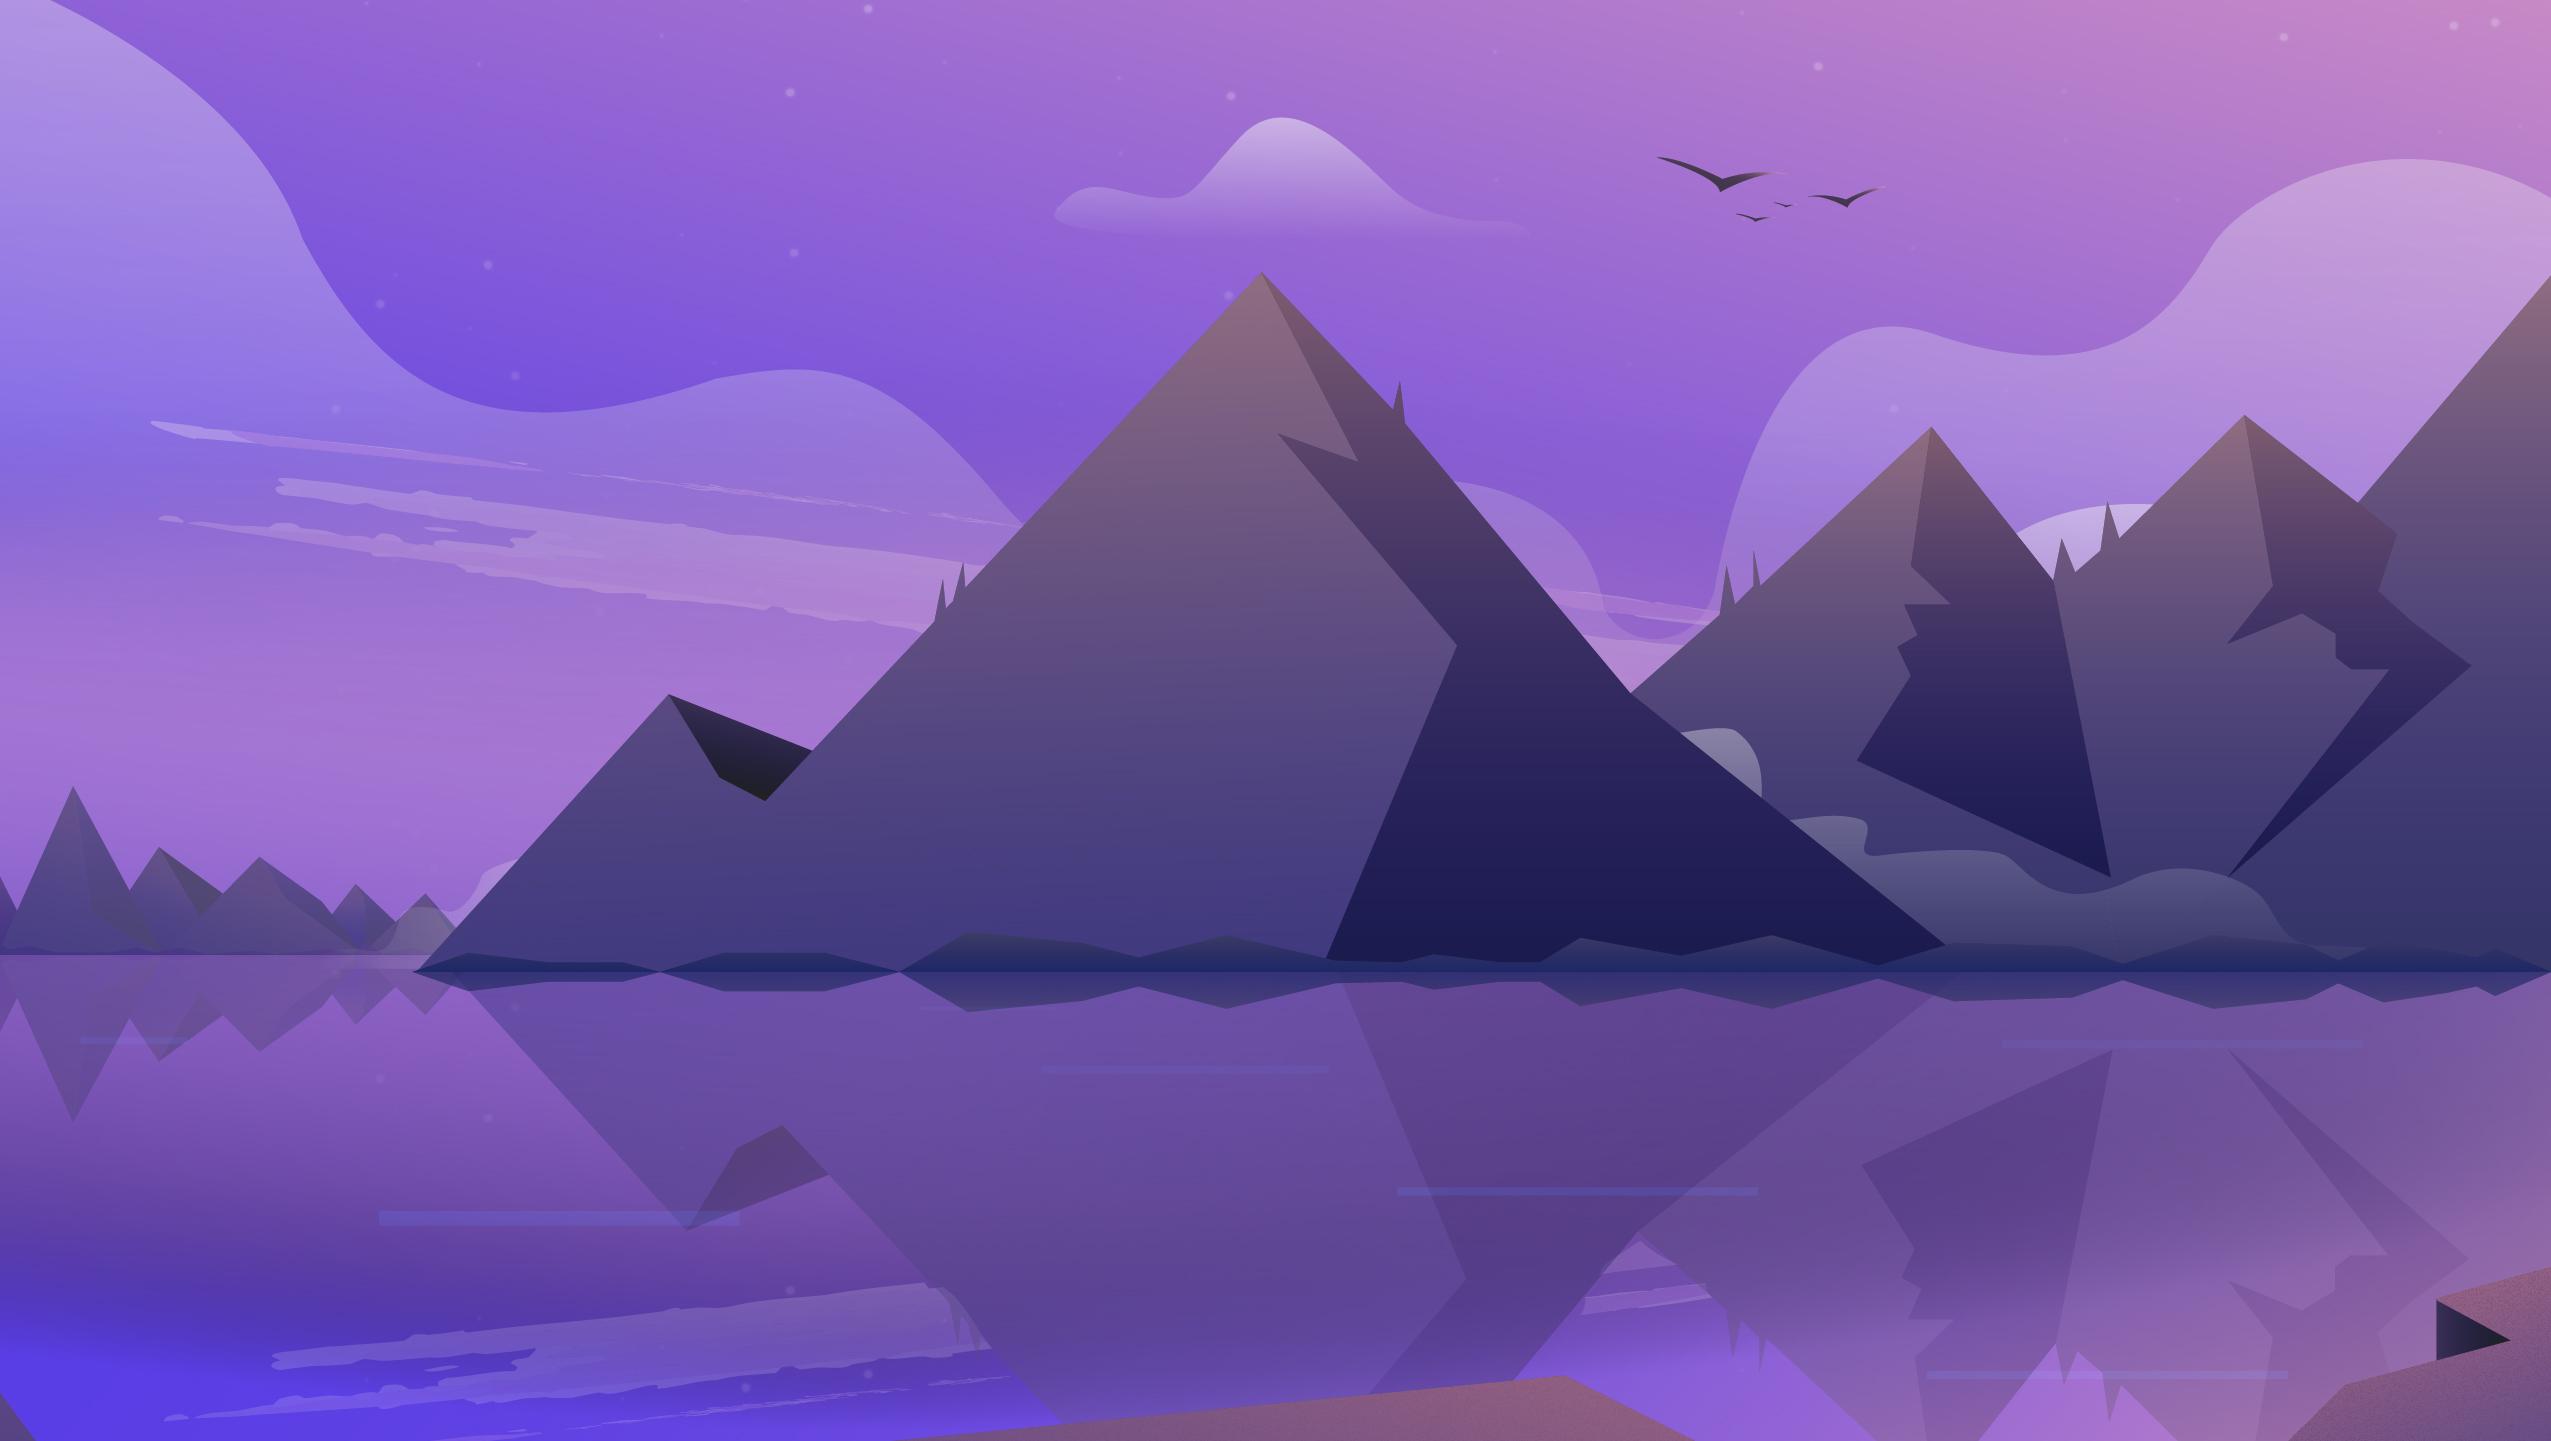 Mountain Illustration Wallpaper 4k , HD Wallpaper & Backgrounds